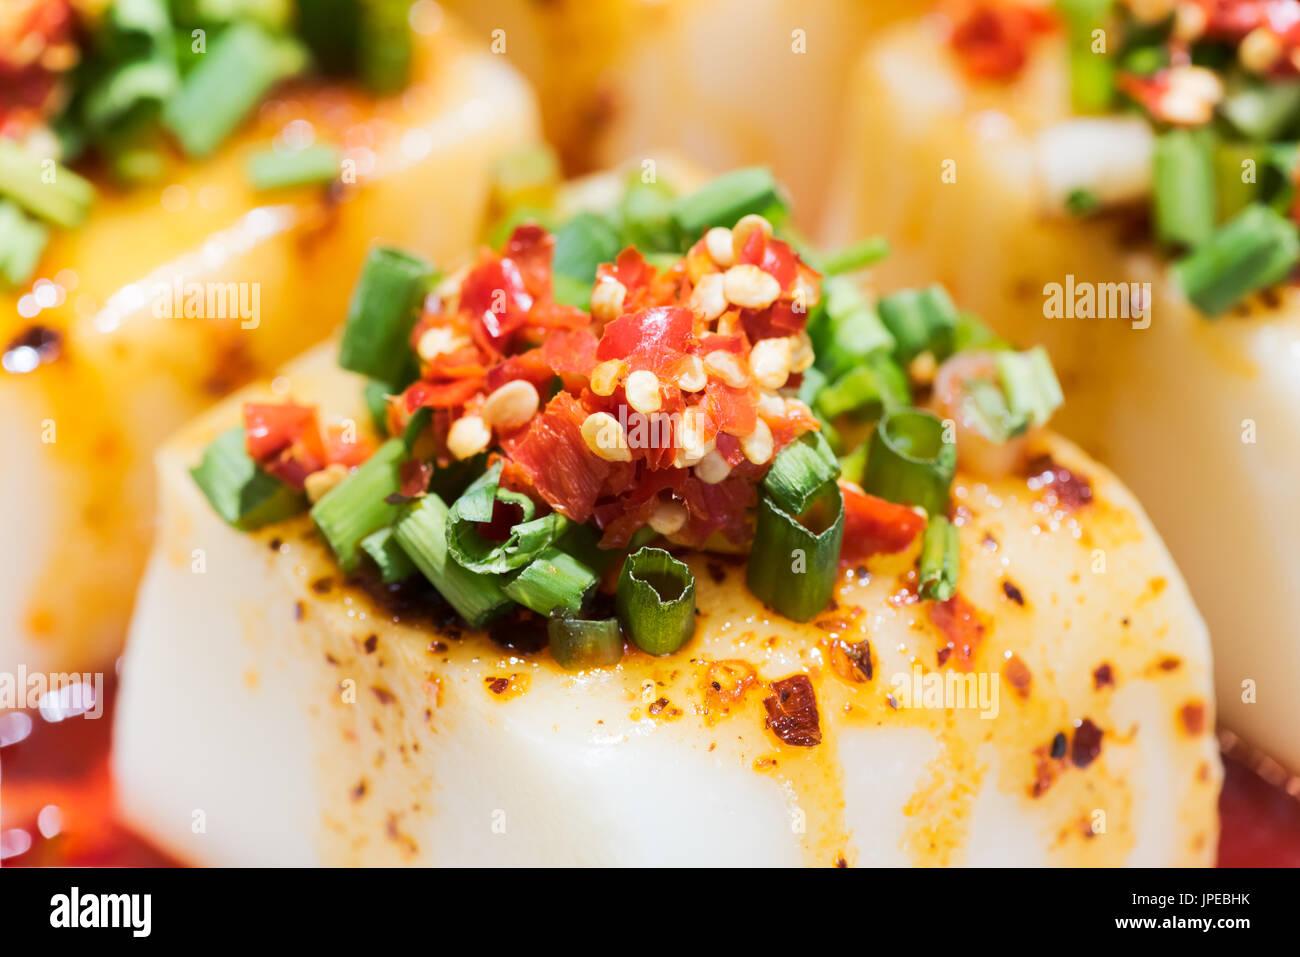 Chinese tofu with chili pepper sauce - chinese food - Stock Image